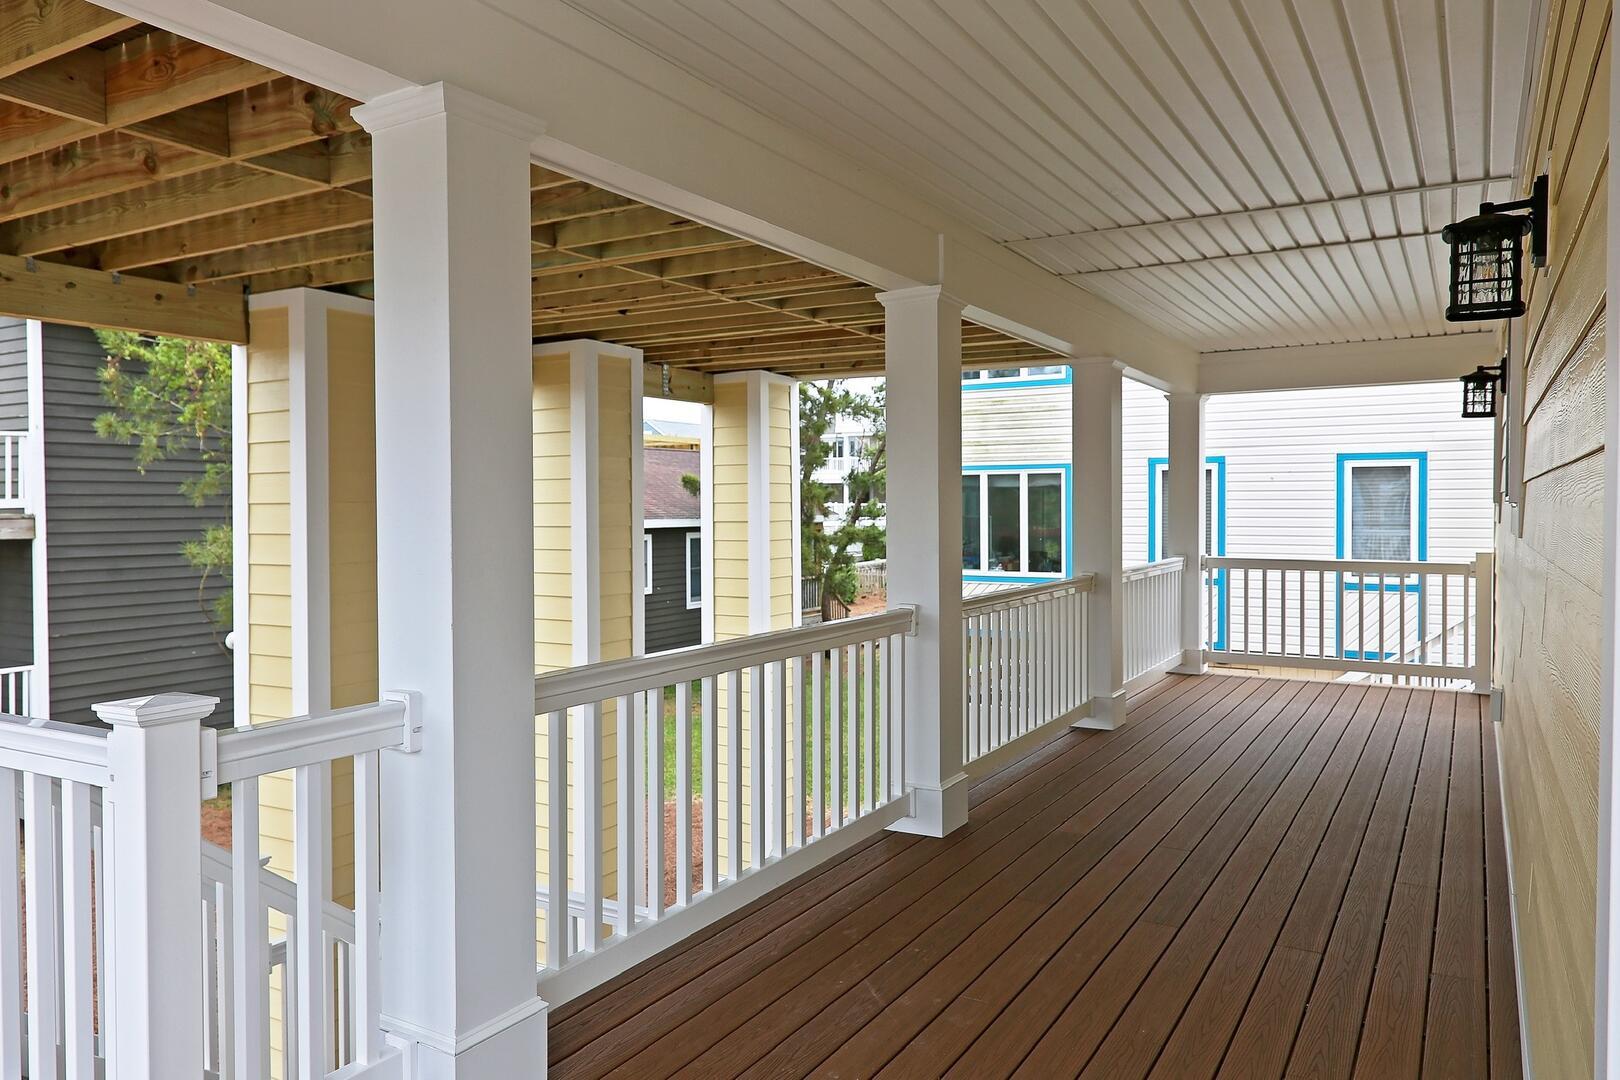 Porch Area - 1611 King and Coastal